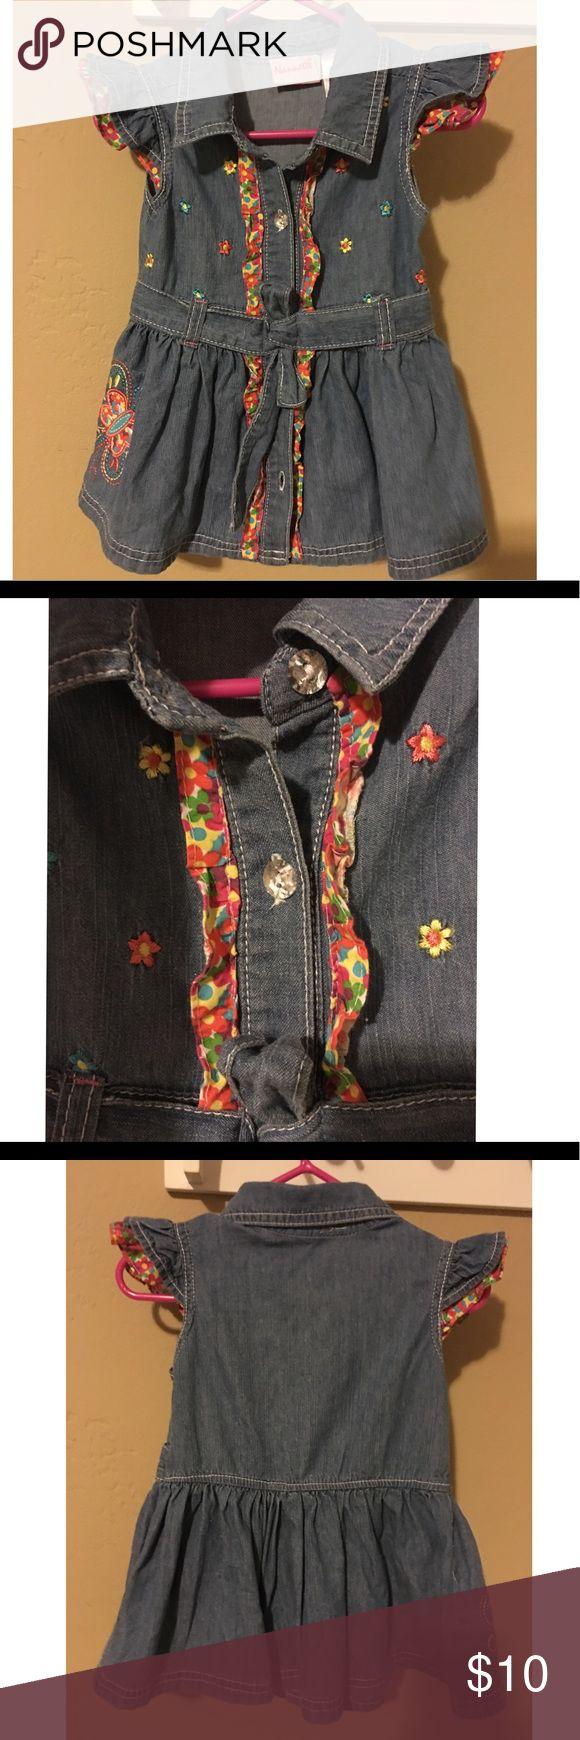 ✨Adorable Nannette Denim dress🎀✨ Worn once! Baby girl denim dress, very good condition! Has denim belt and well taken care of! 🎀👶💖 Nannette Dresses Casual